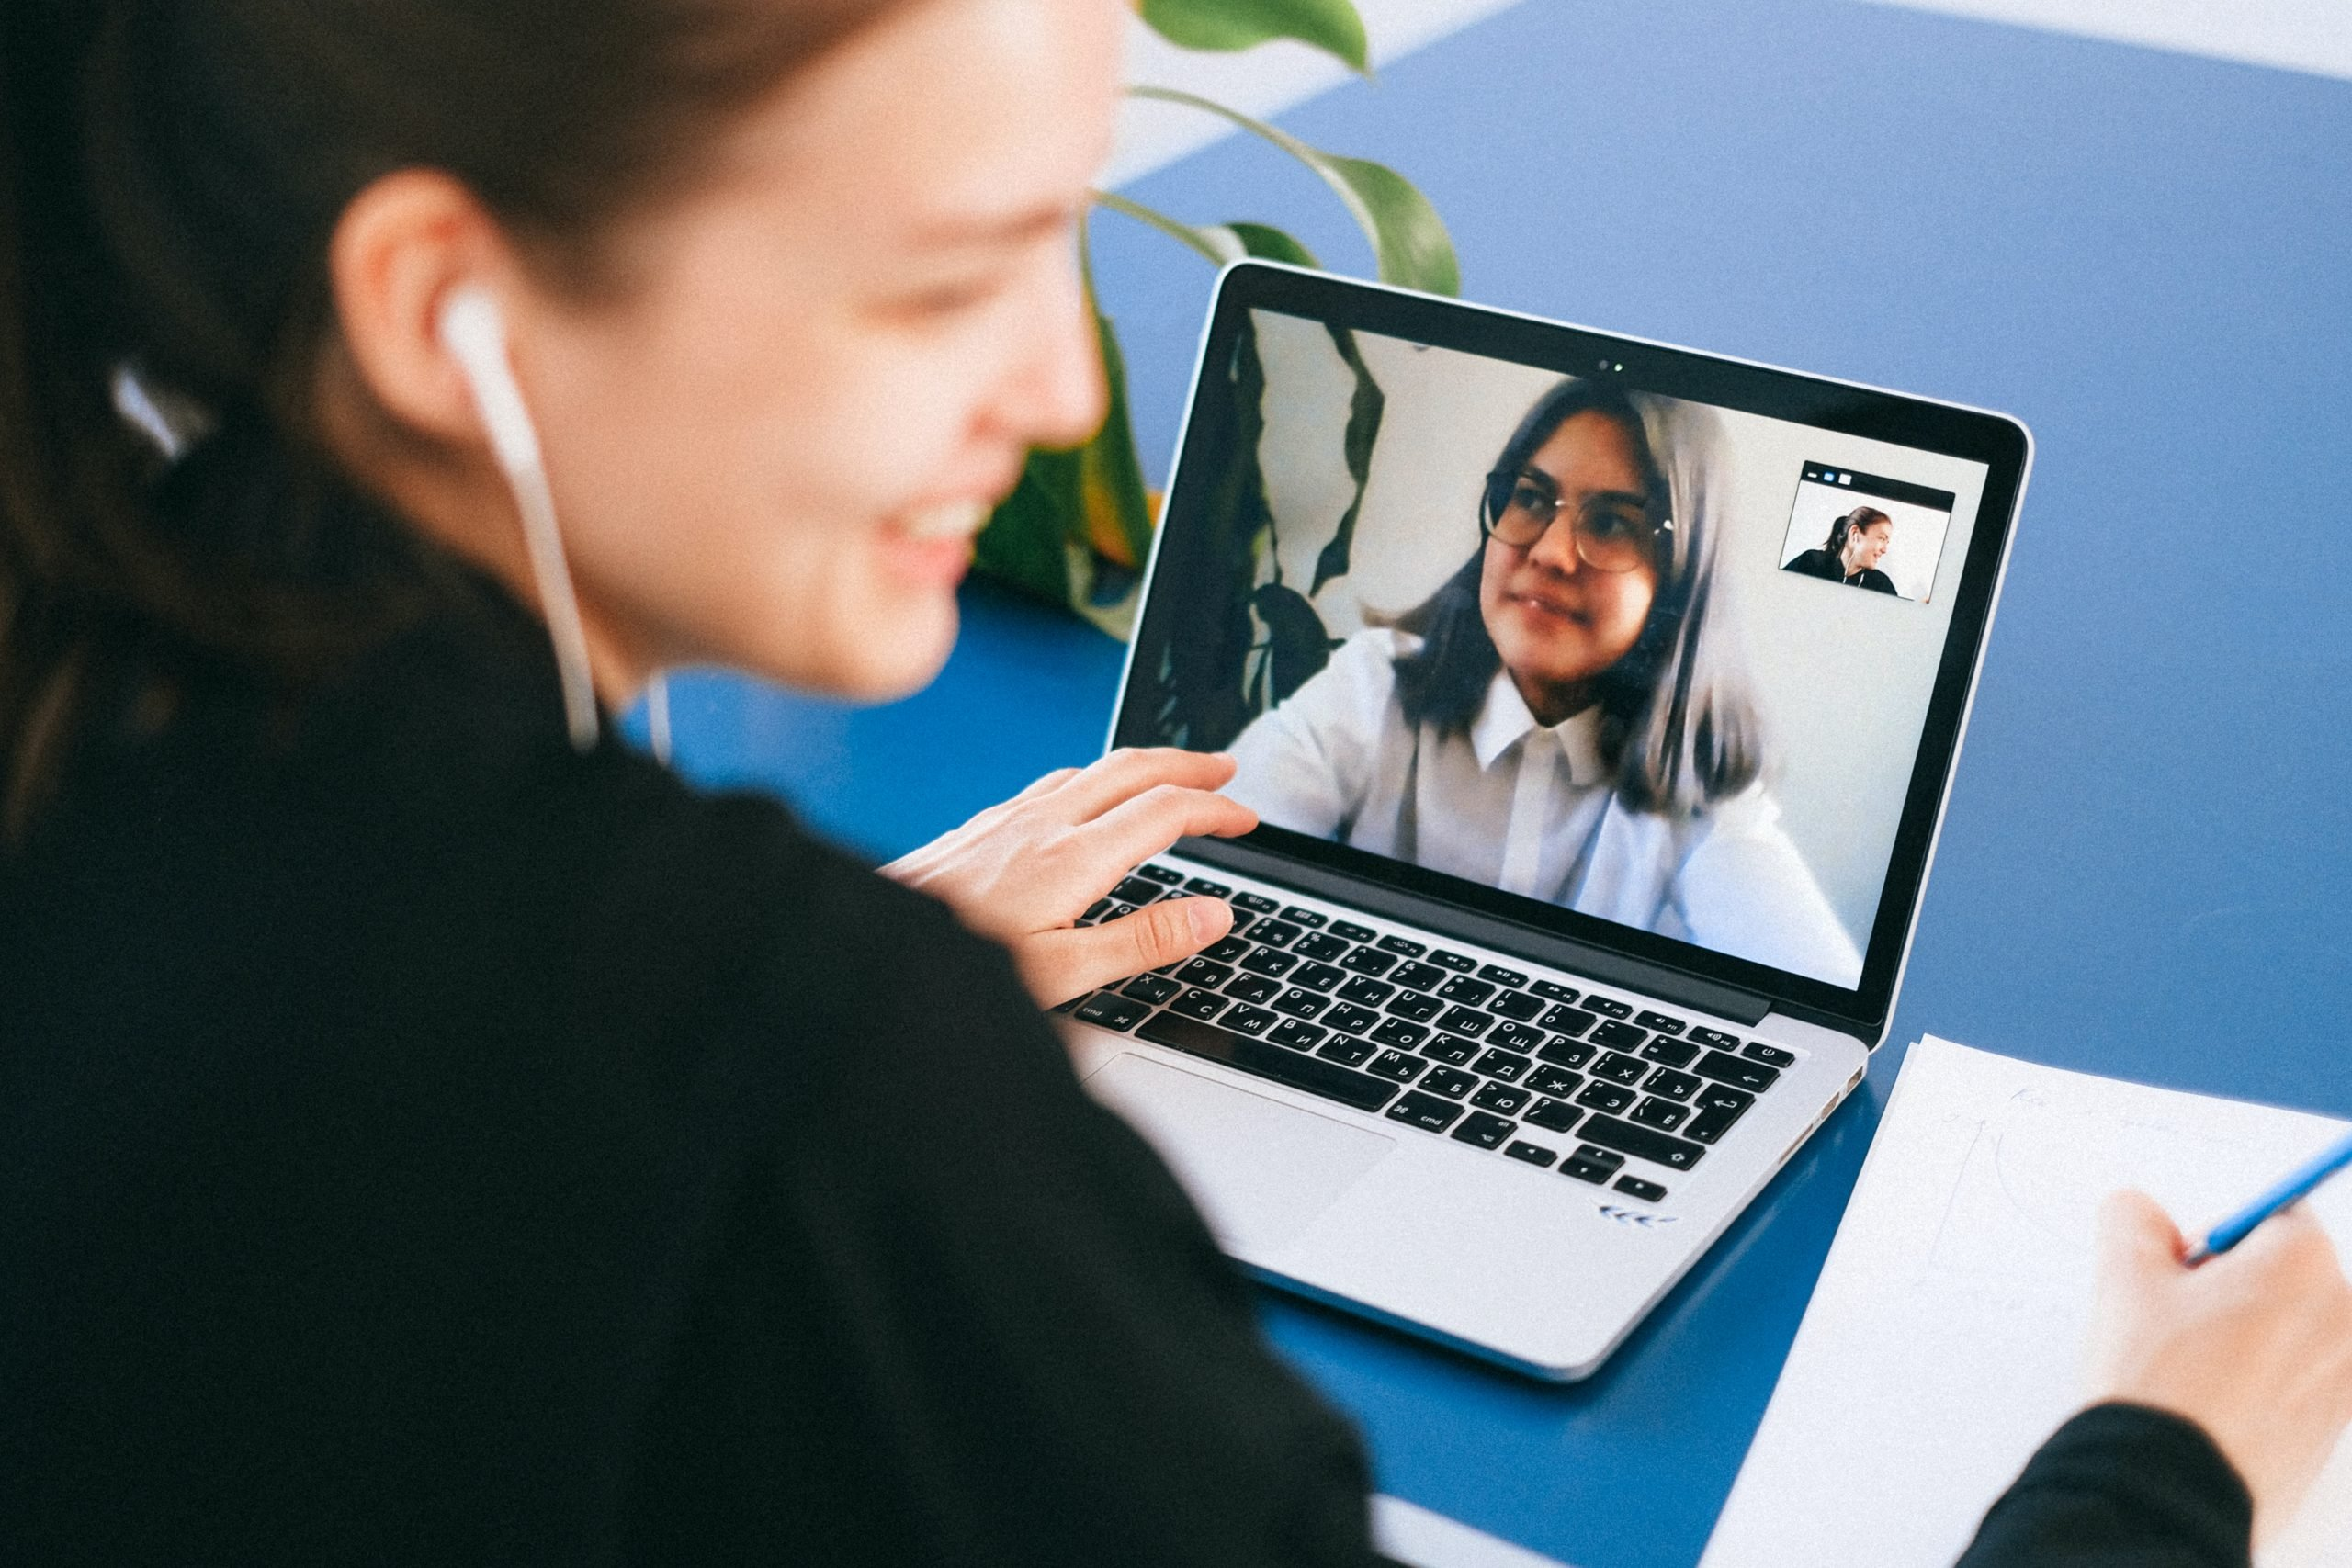 Importance of Digital Meeting